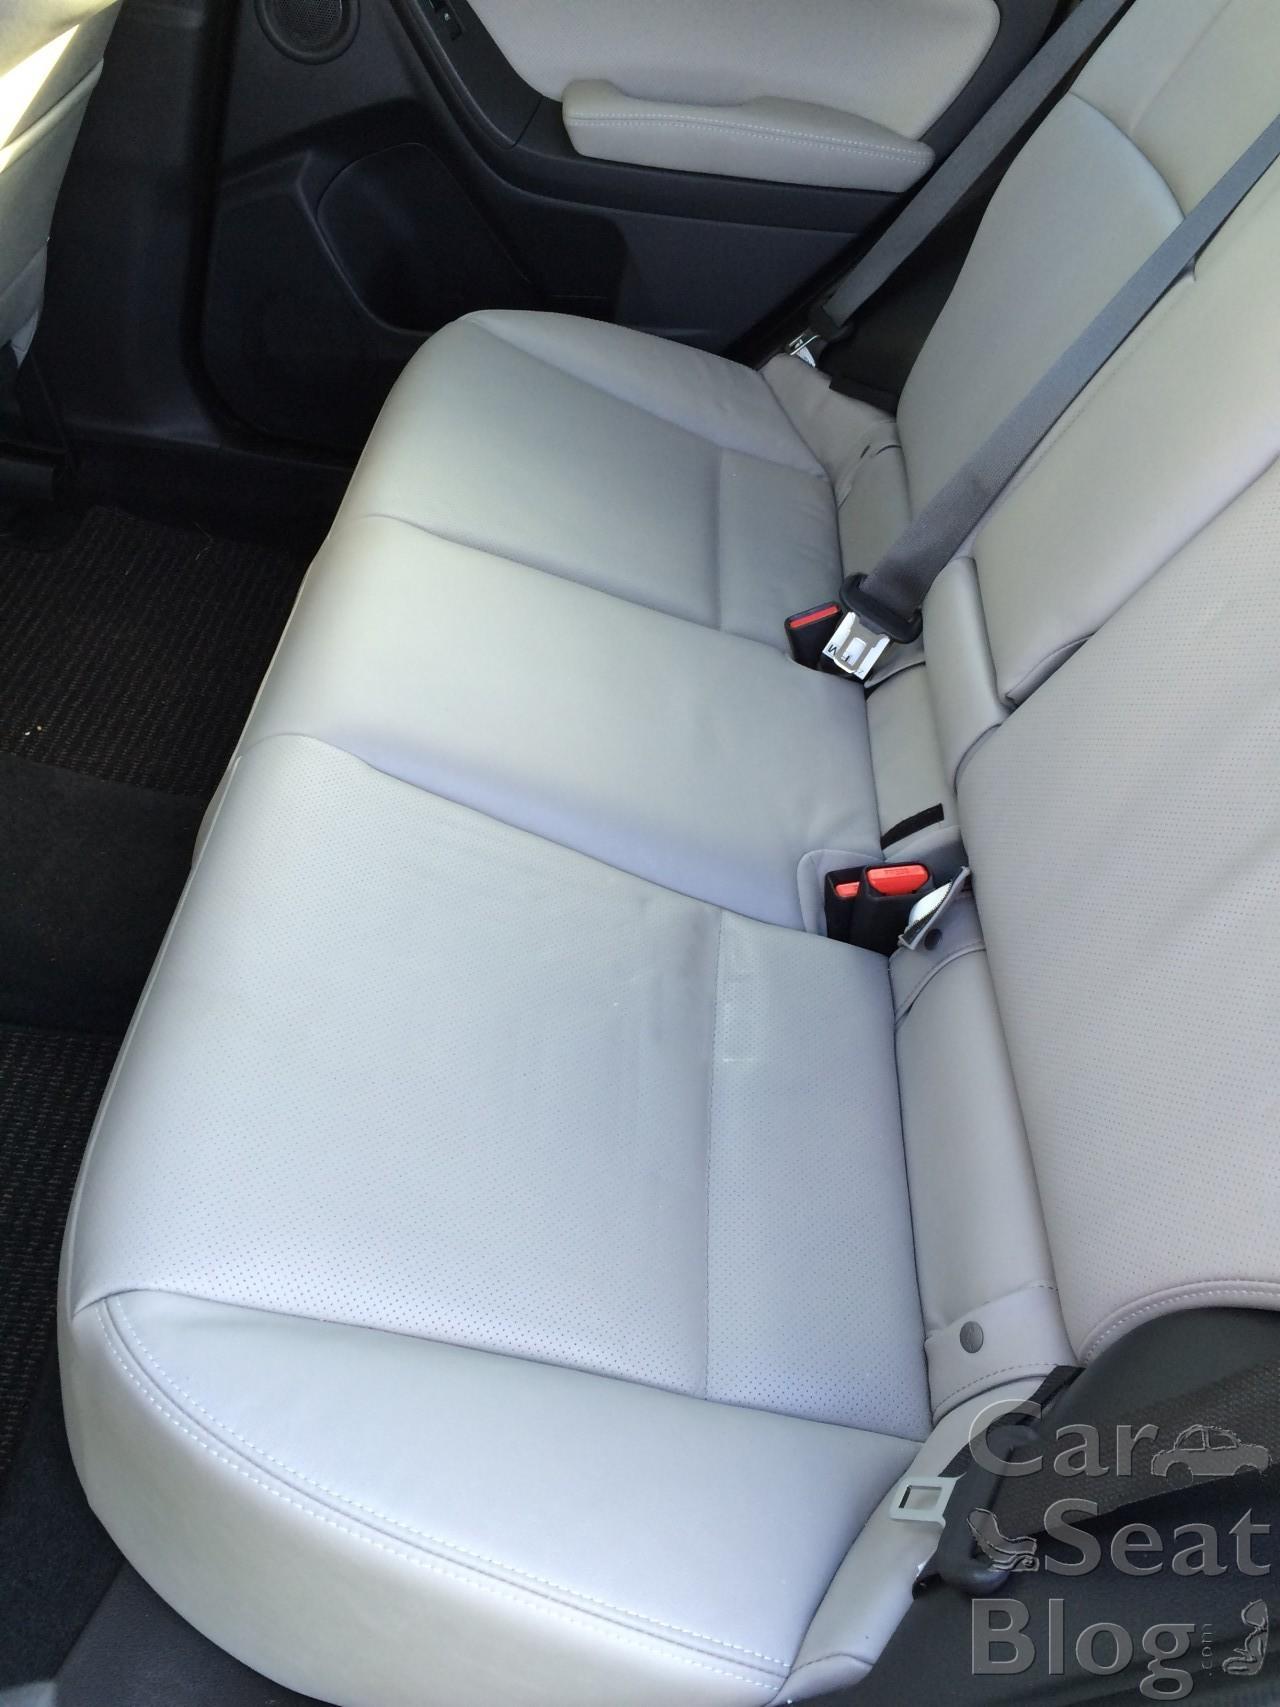 Rear seatbelts (except rear center seatbelt on Outback)